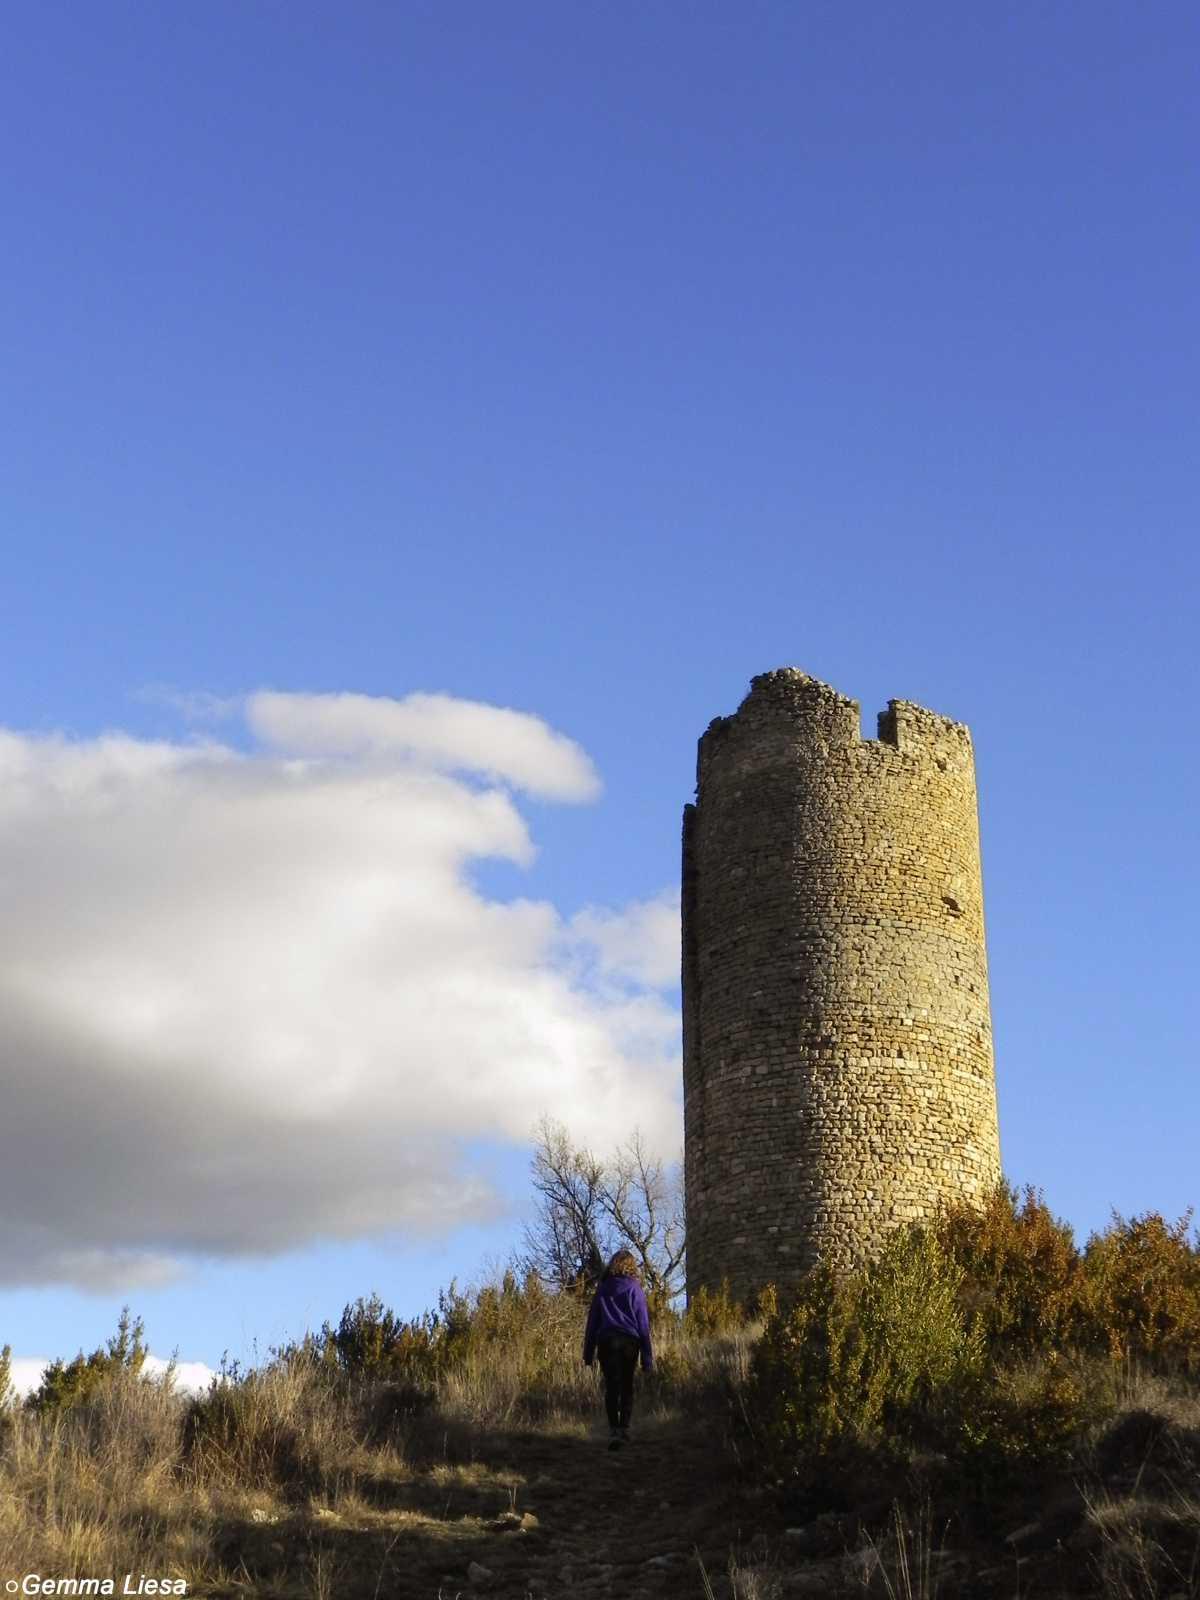 PR-HU 206: Chiriveta - Ermita - Castillo - Chiriveta